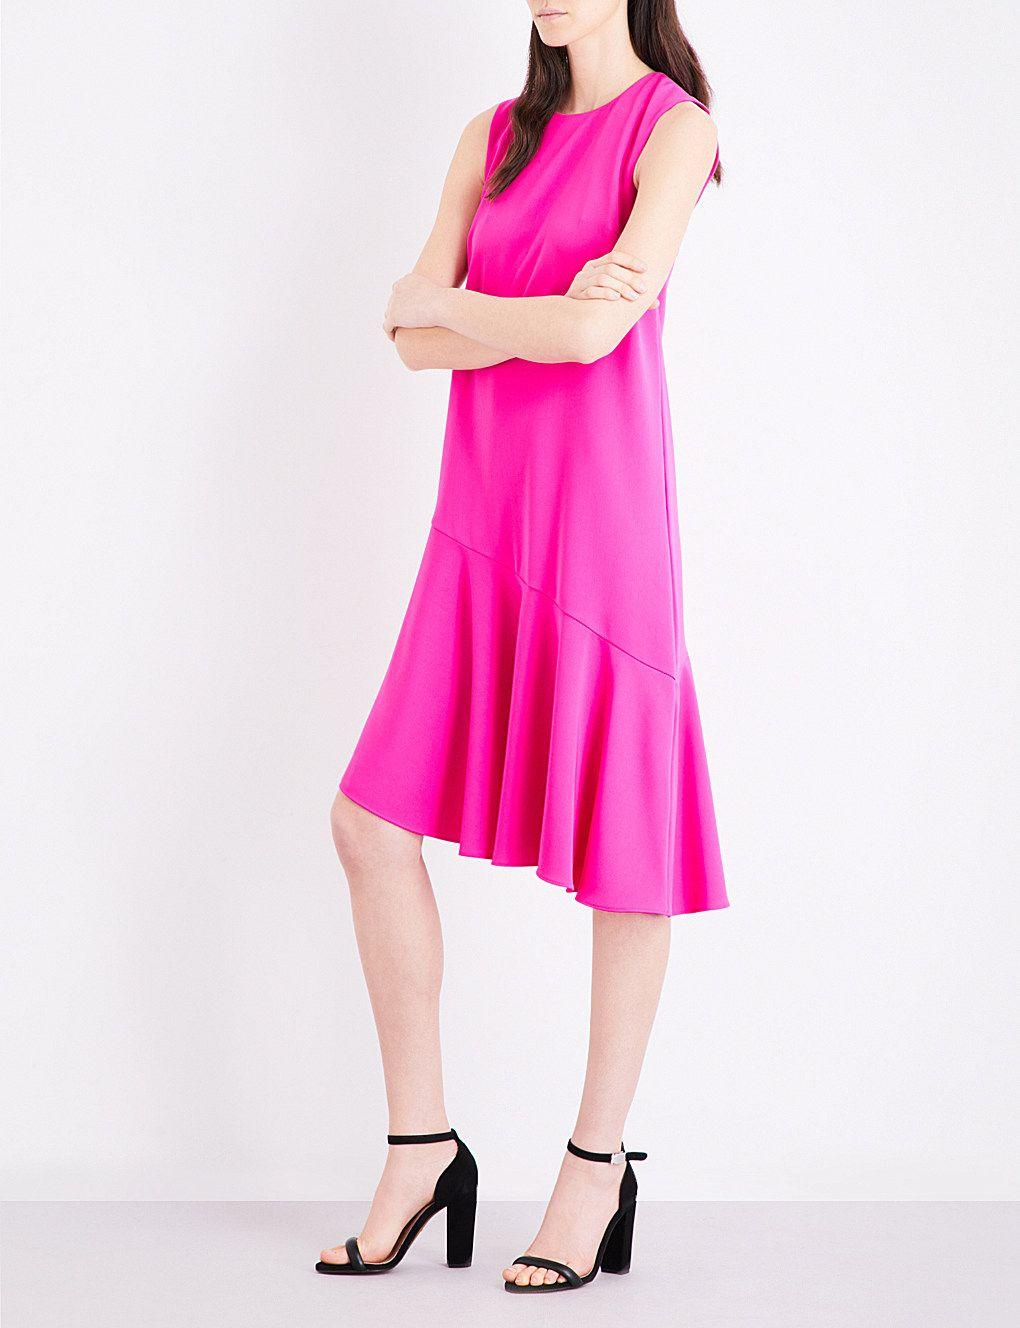 WAREHOUSE Ruffled-hem crepe dress   Moll\'s stuff   Pinterest ...